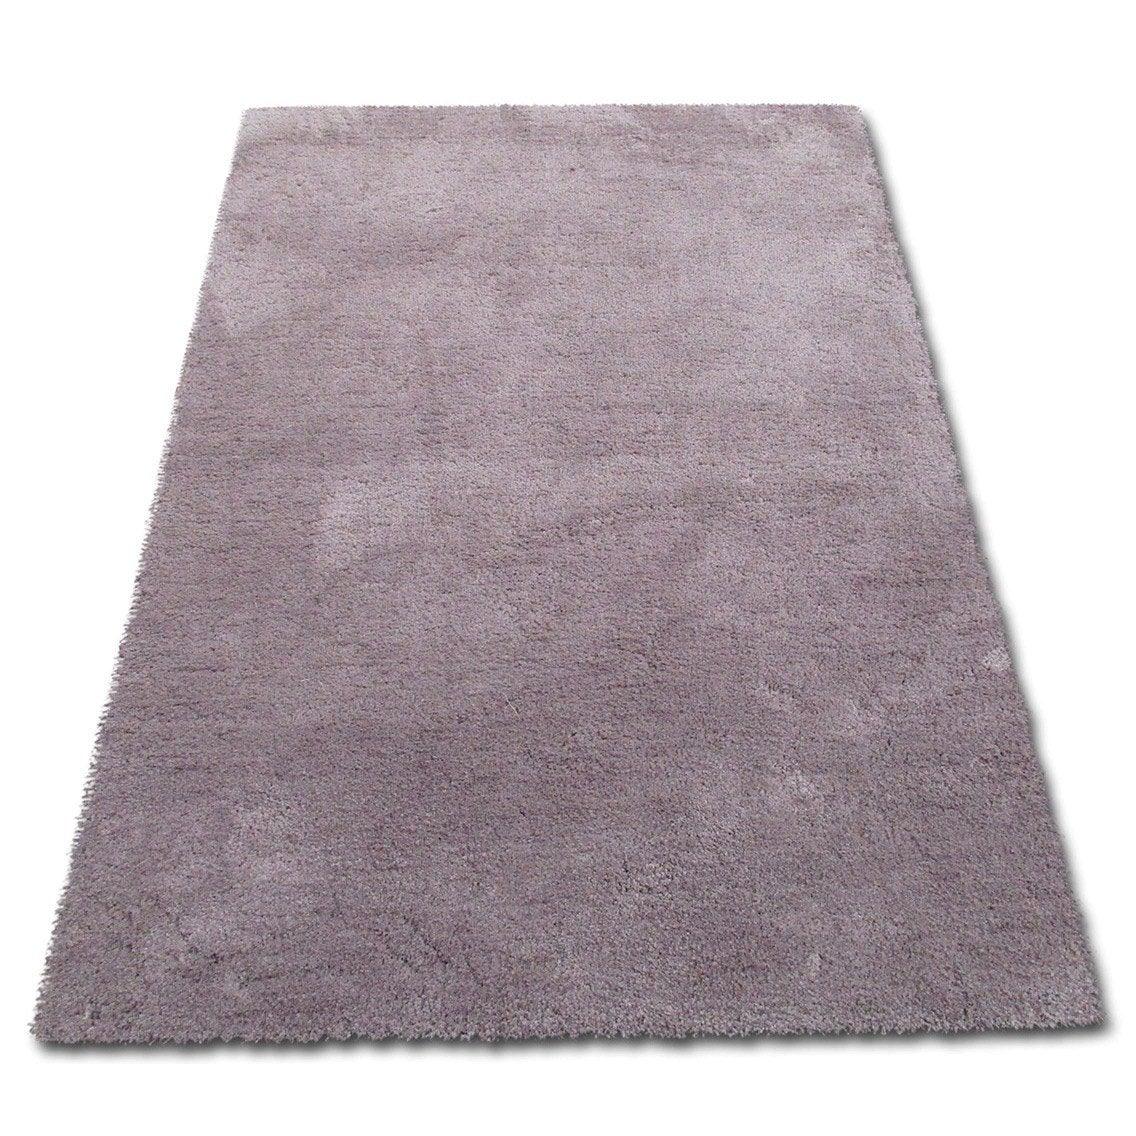 tapis taupe shaggy l100 x l150 cm diam15 - Tapis Taupe